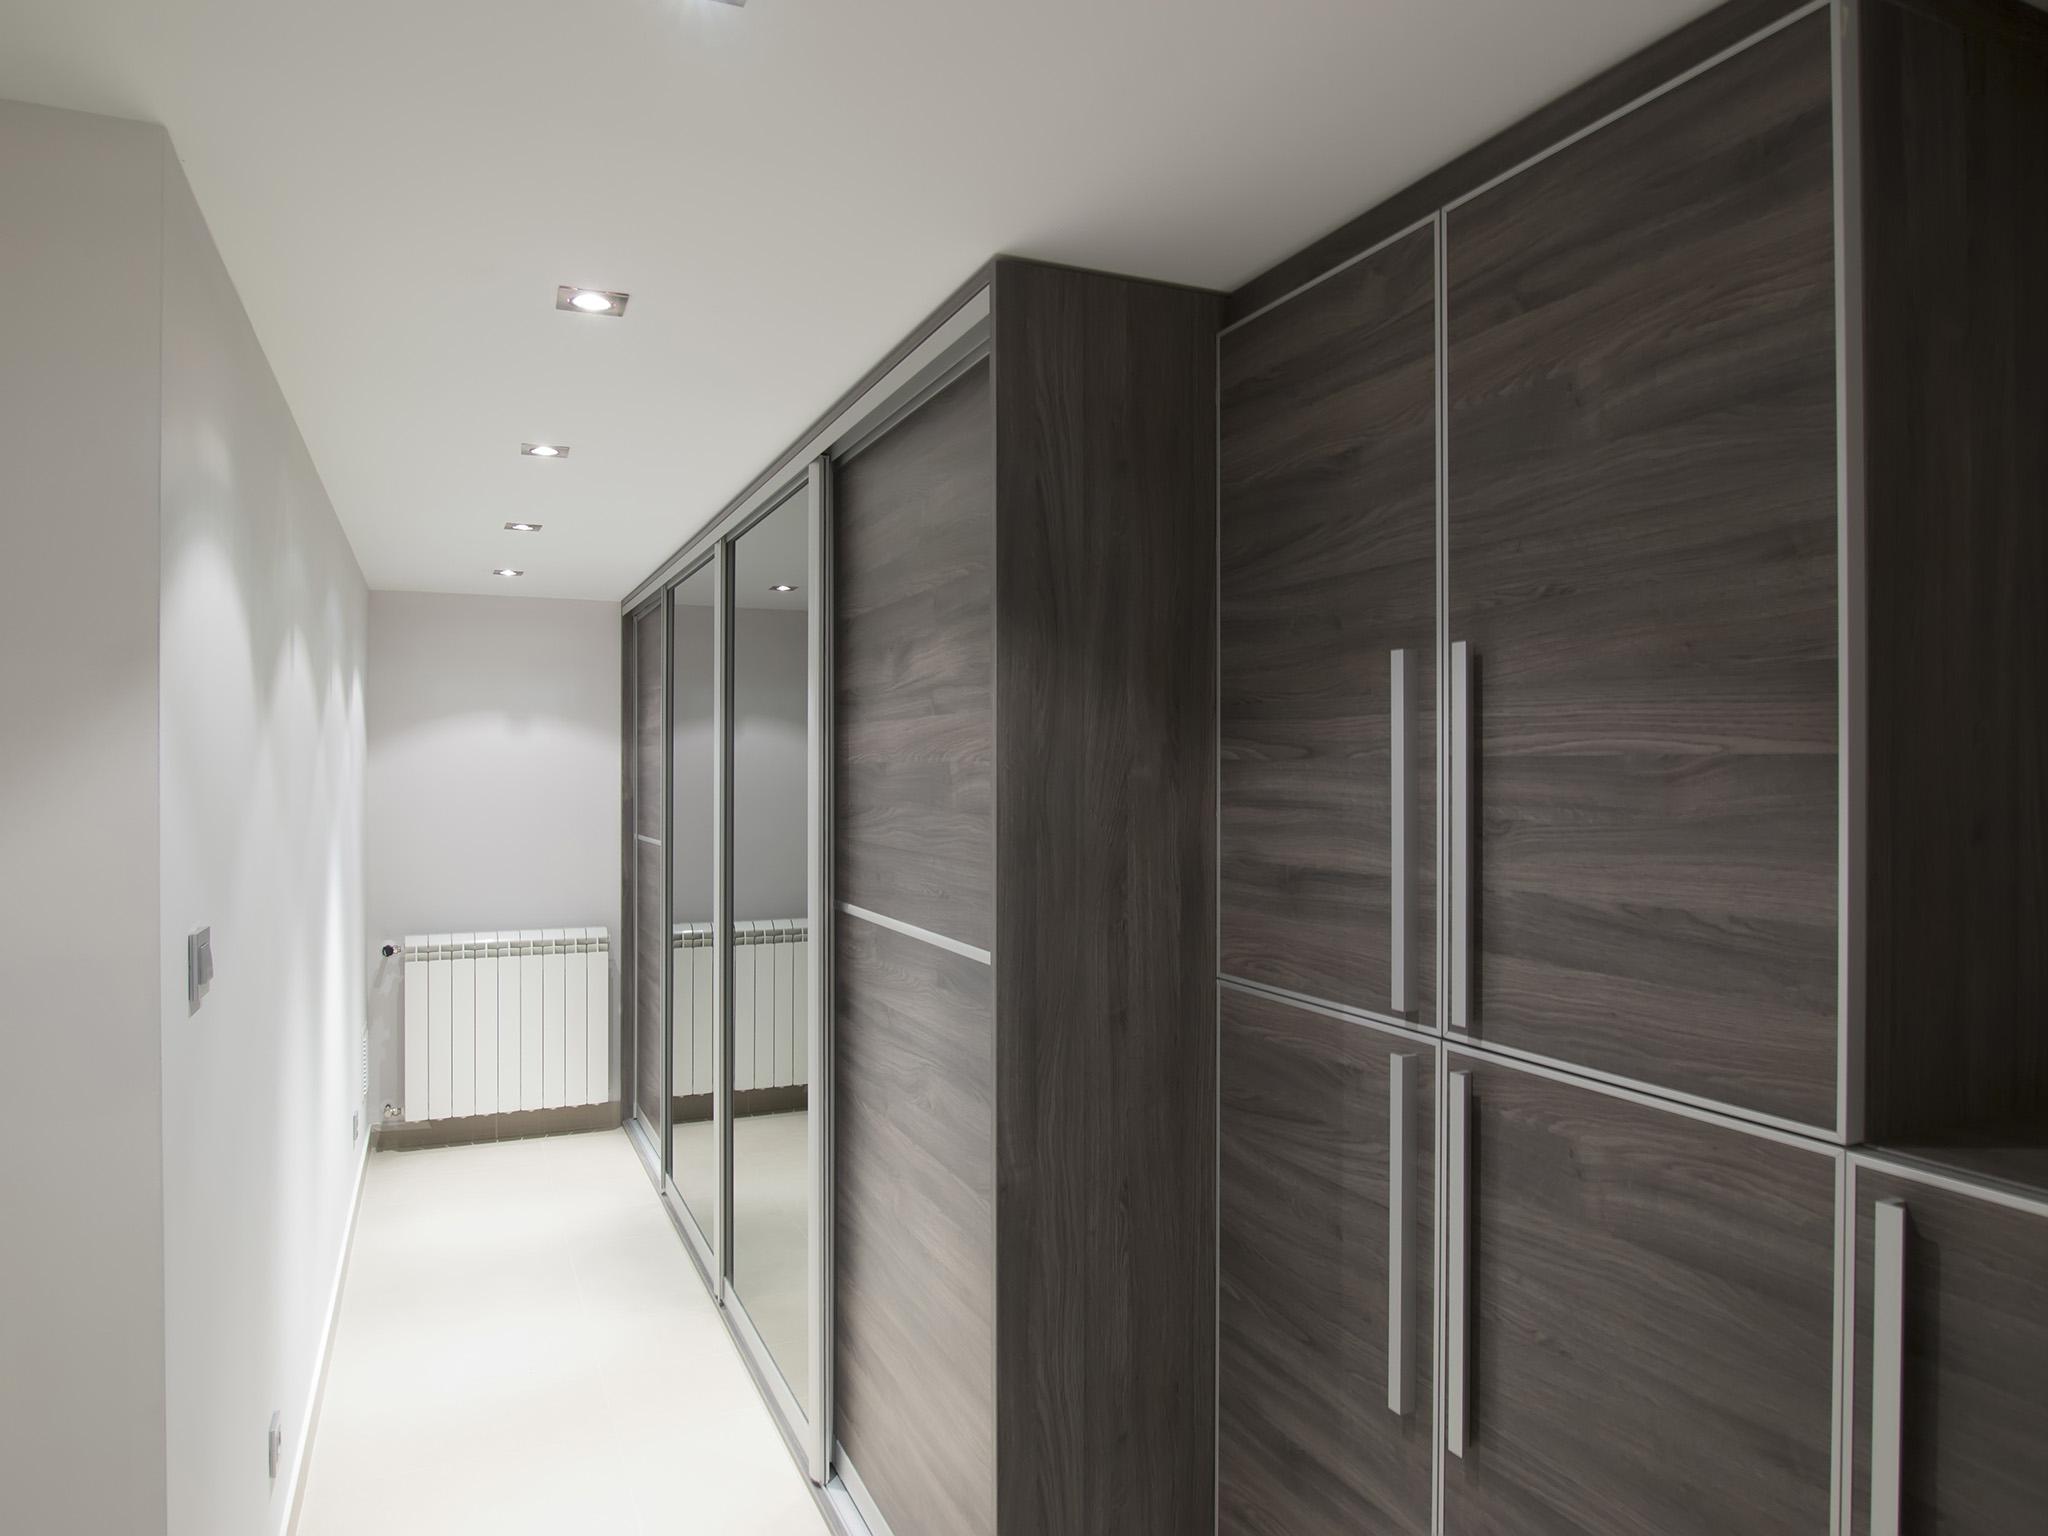 grey wardrobe doors, sliding wardrobe doors, modern wardrobes